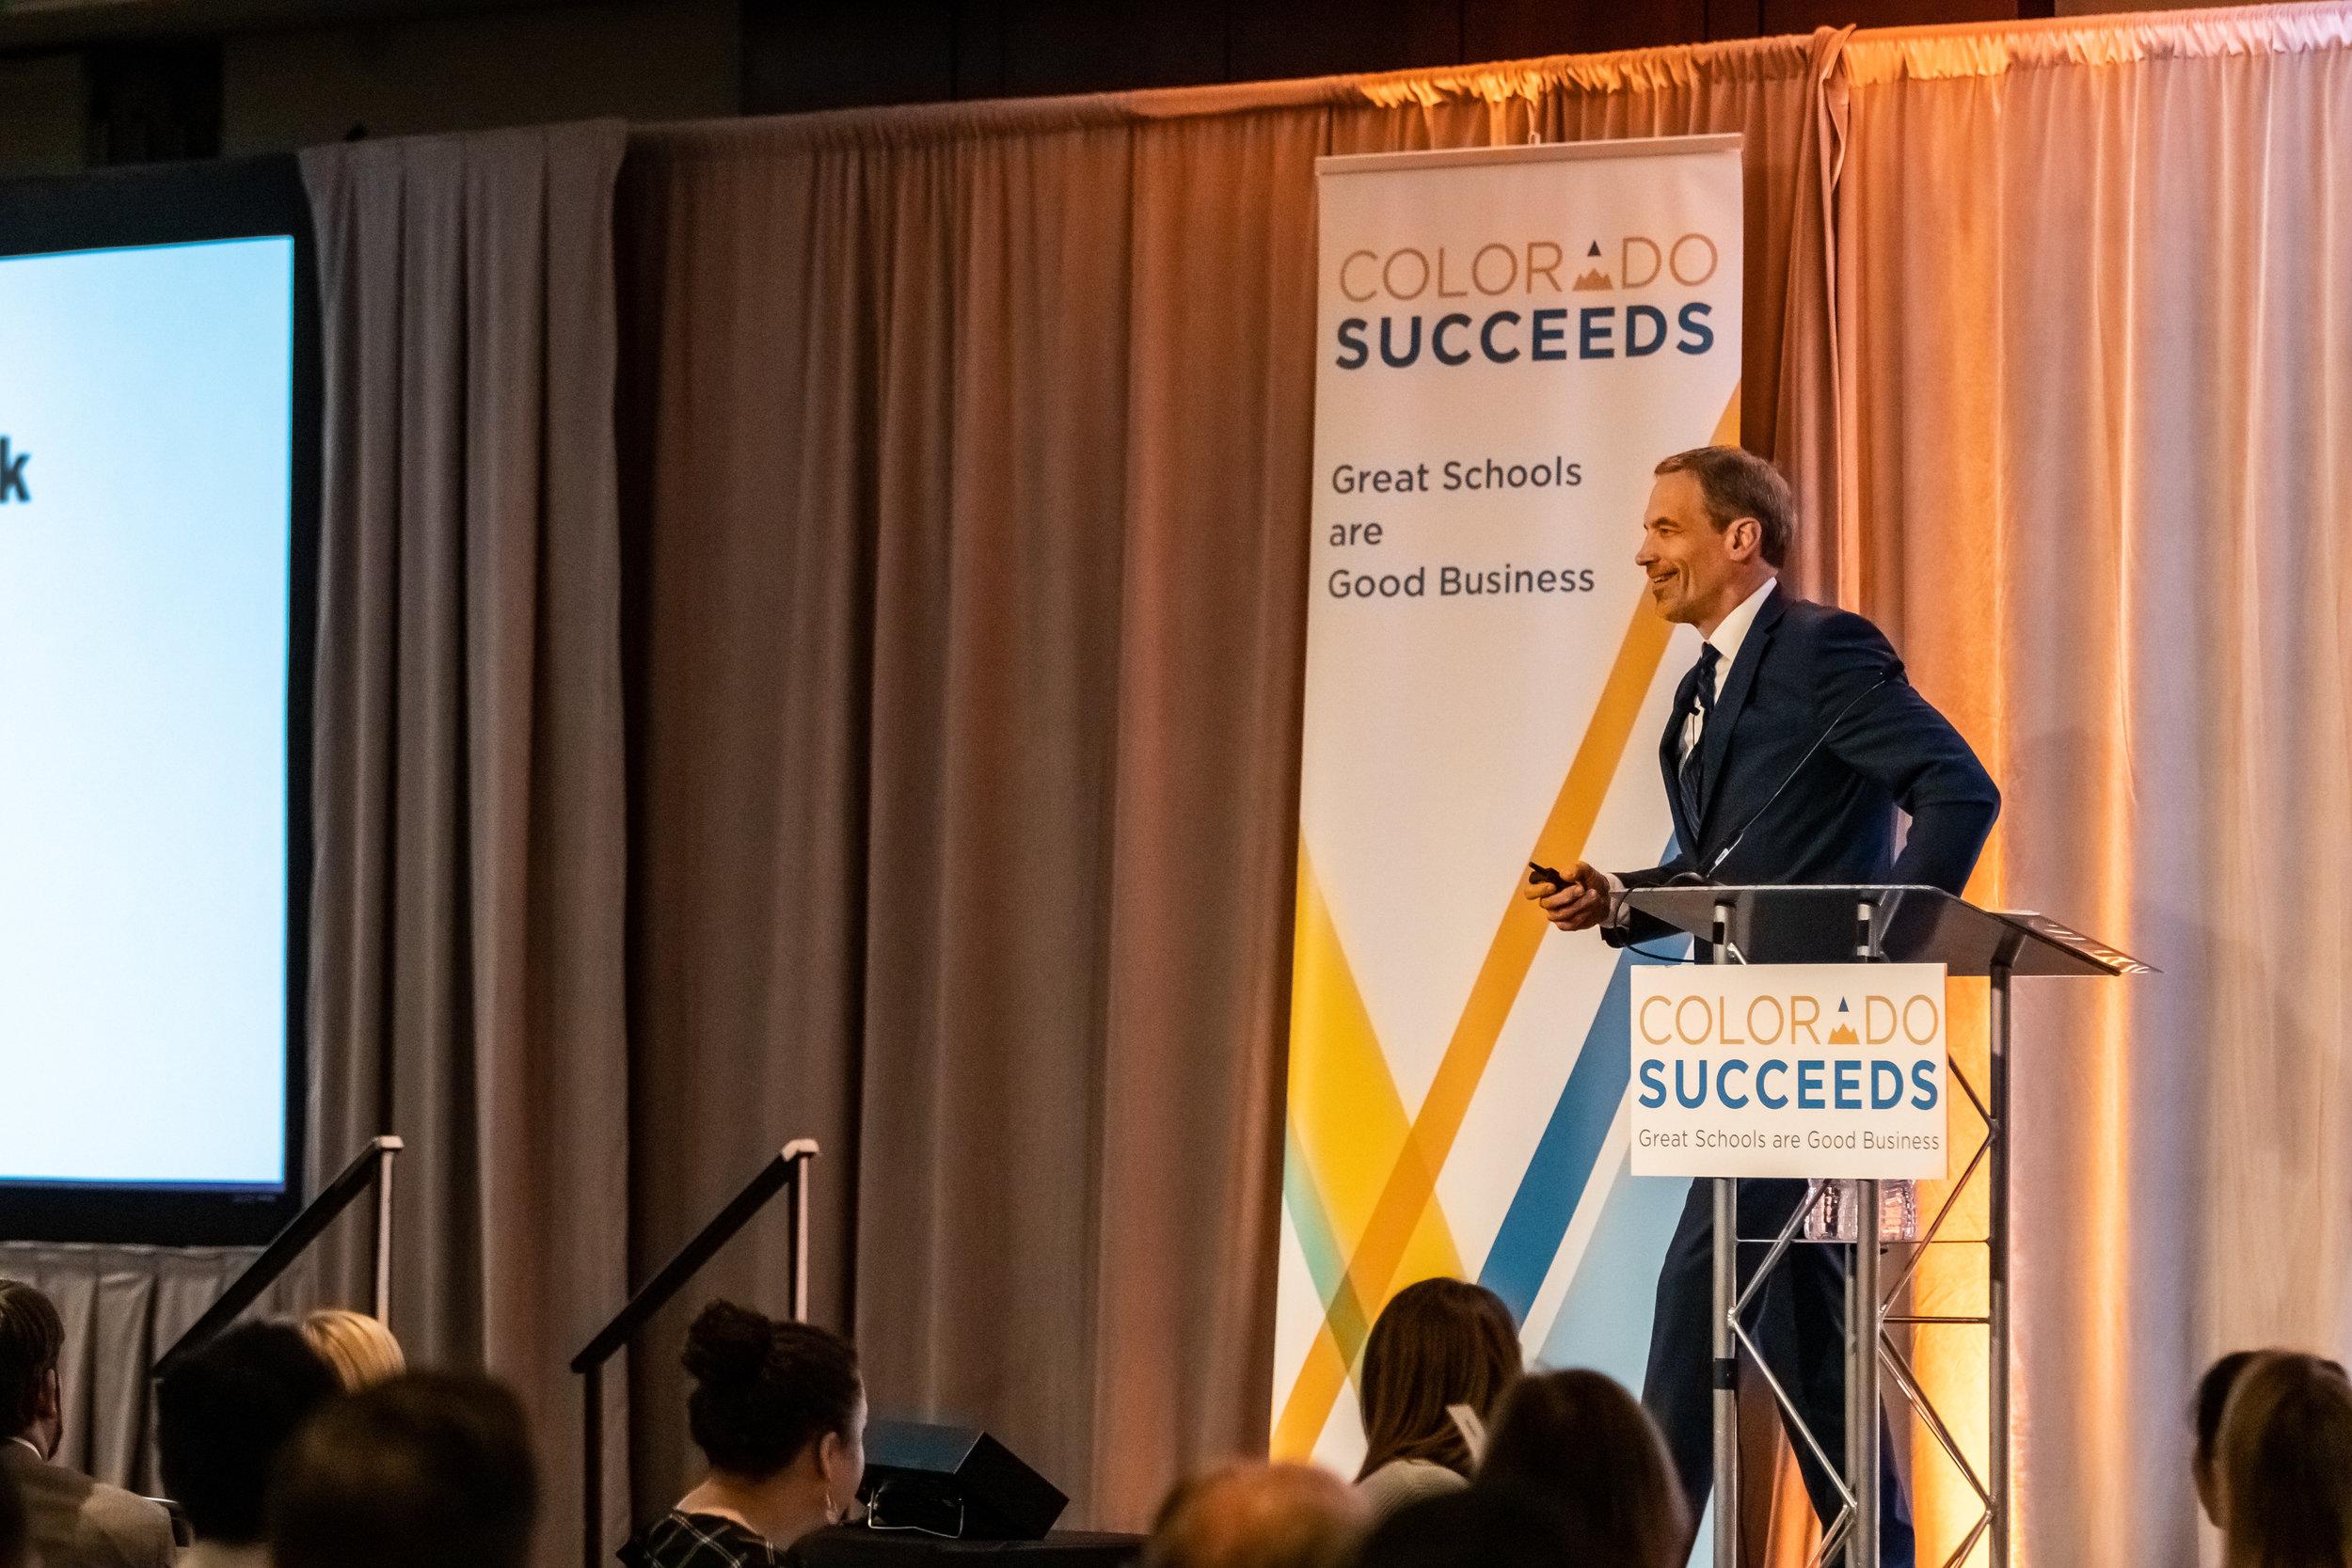 Colorado Succeeds: Great Schools are Good Business 2019